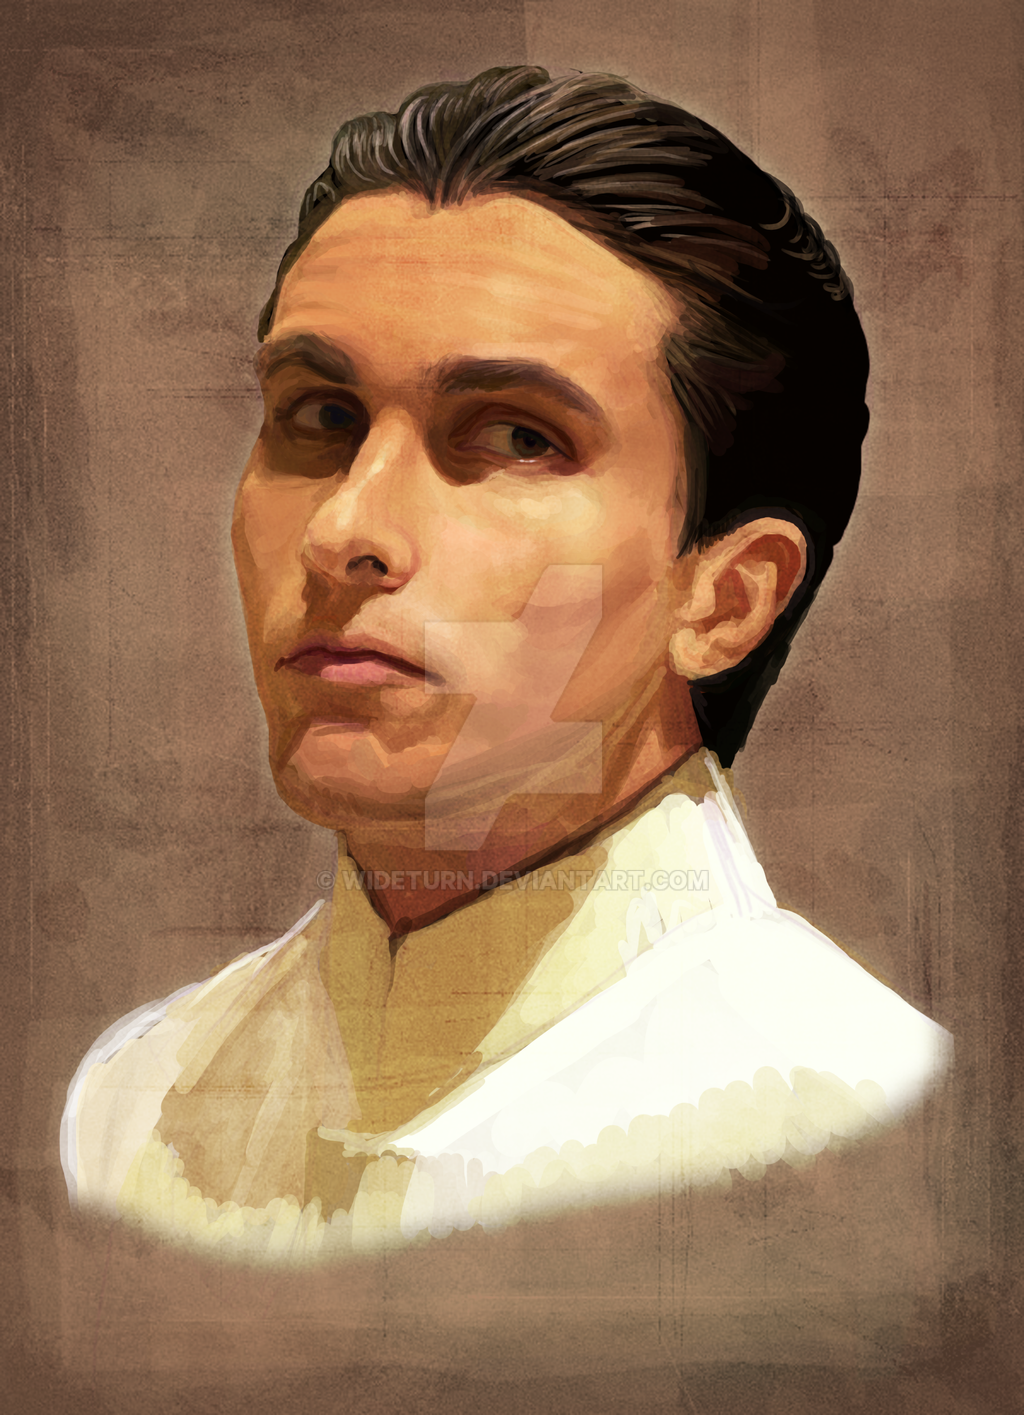 Christian Bale by rorymac666 on DeviantArt